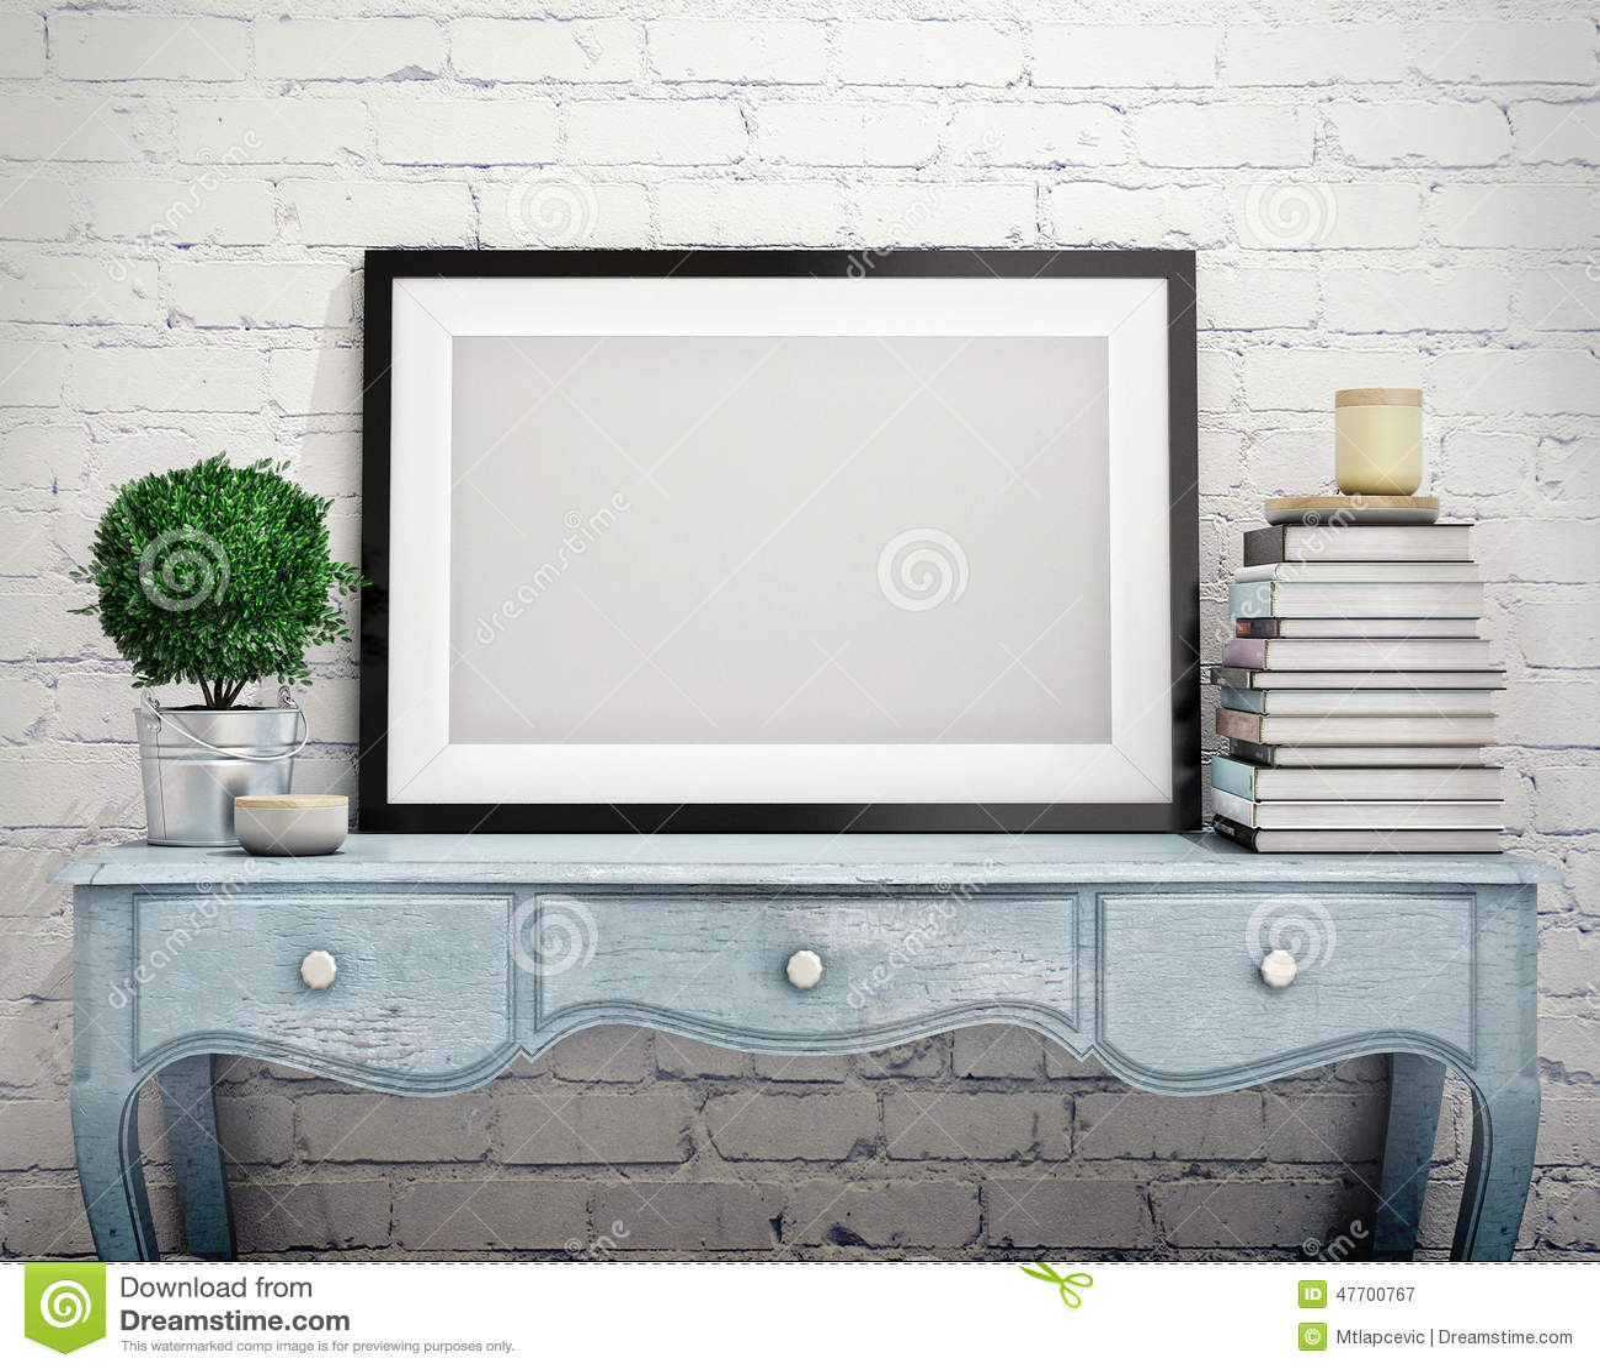 Mock up poster frame on vintage chest of drawers, interior